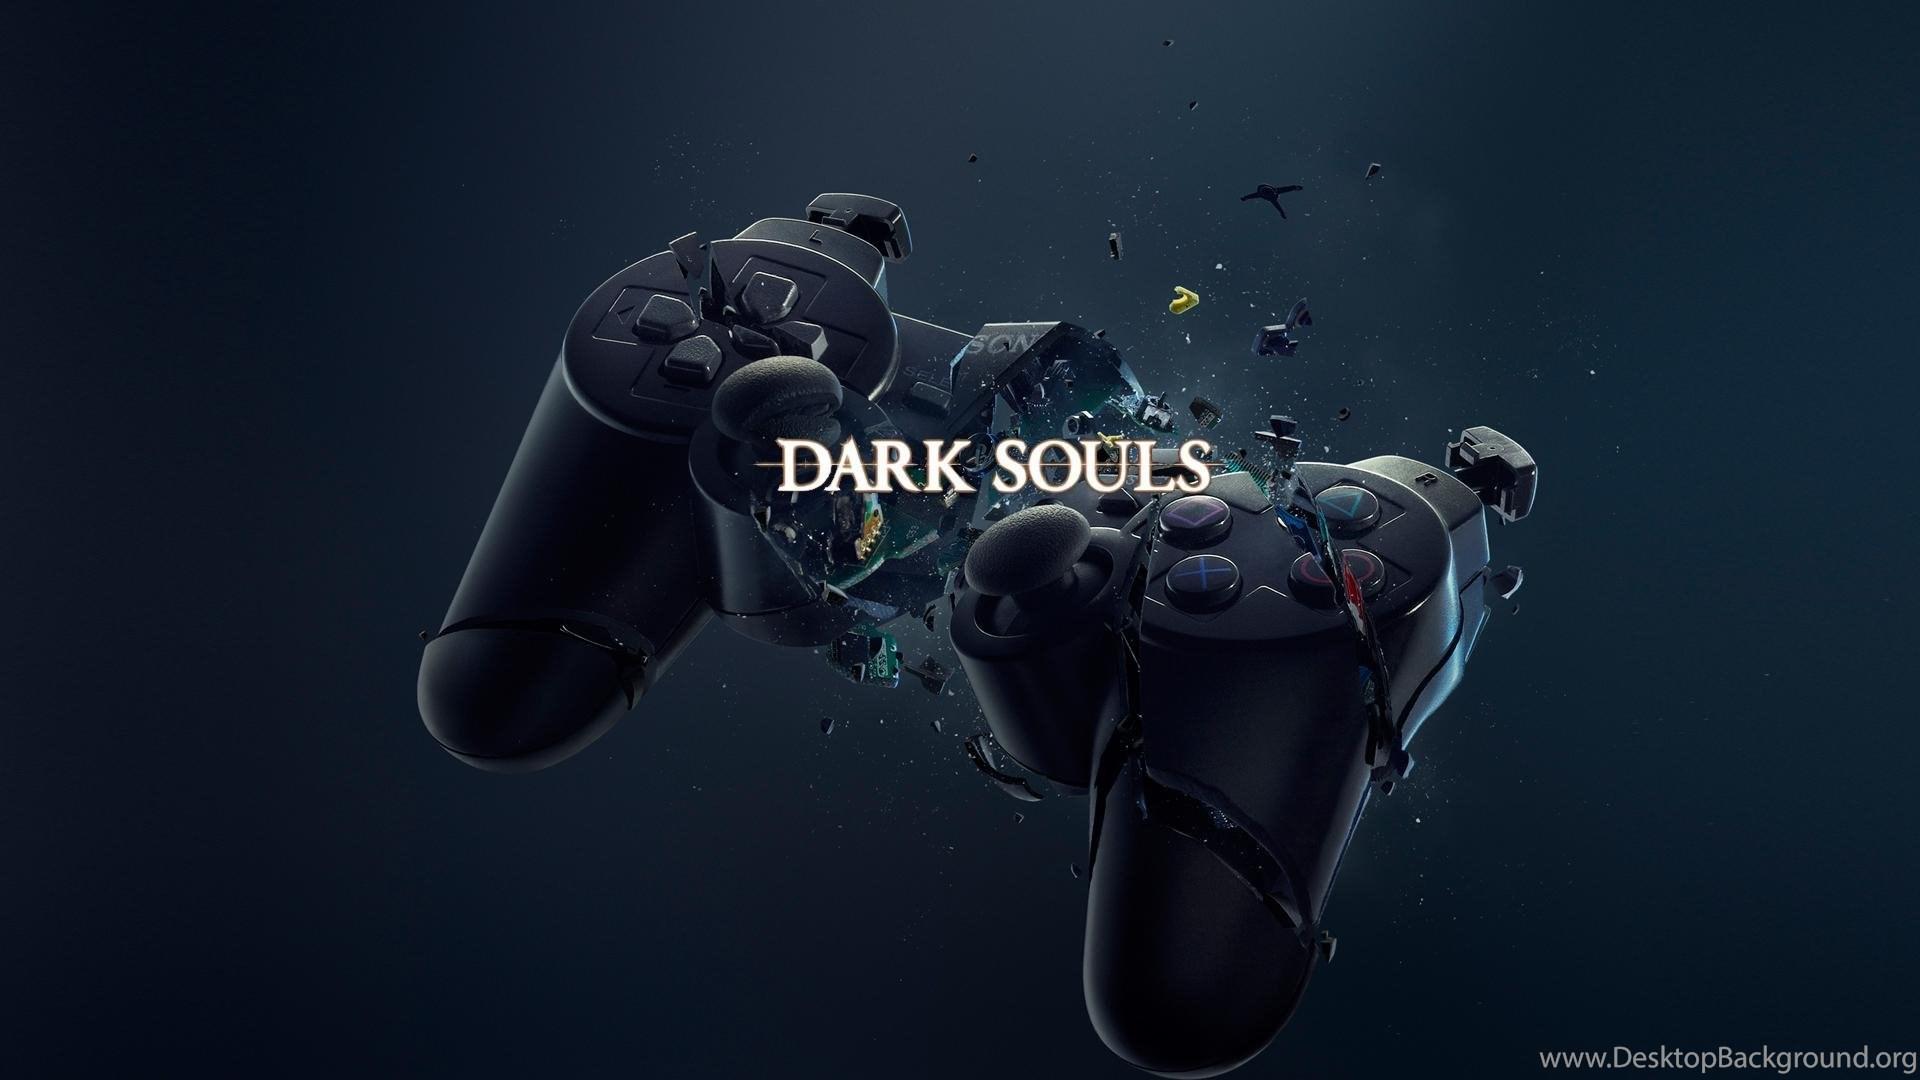 Dark Souls 2 Artwork Backgrounds Hd Wallpapers Desktop Background